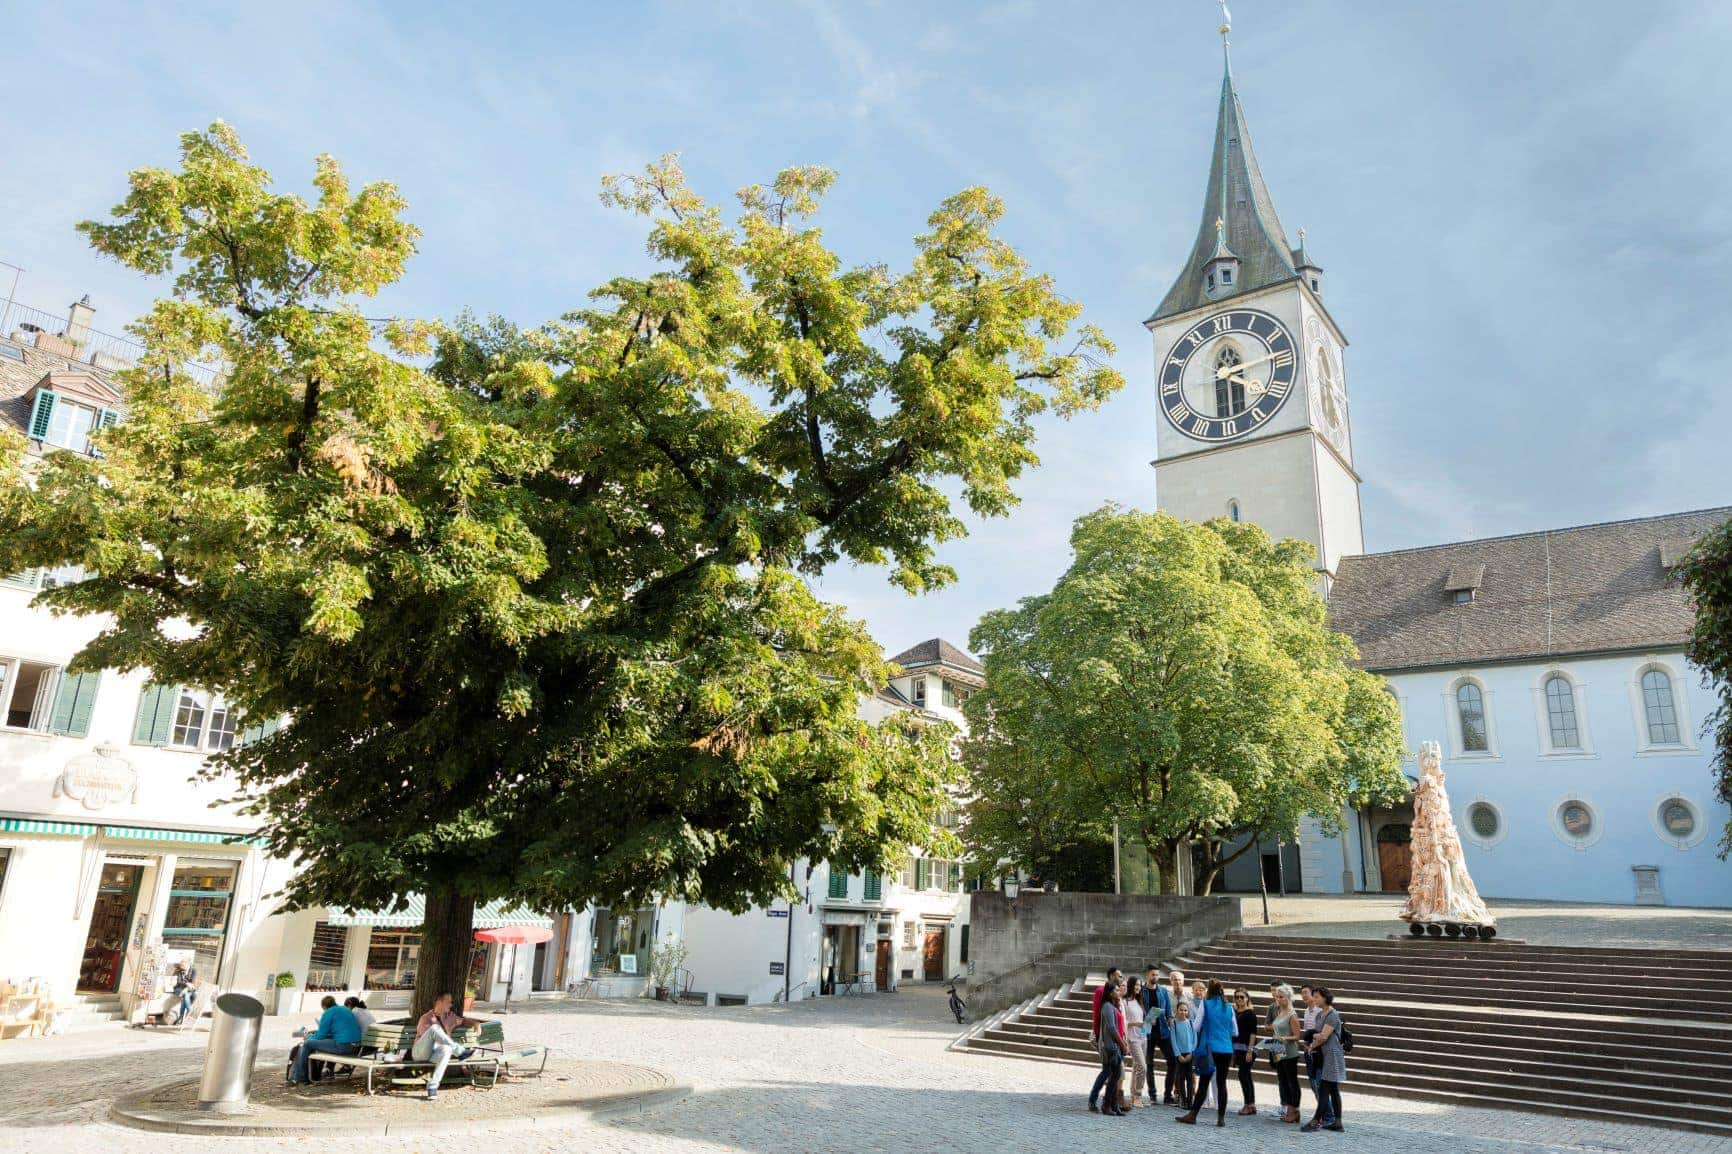 Kirche St. Peter in Zürich